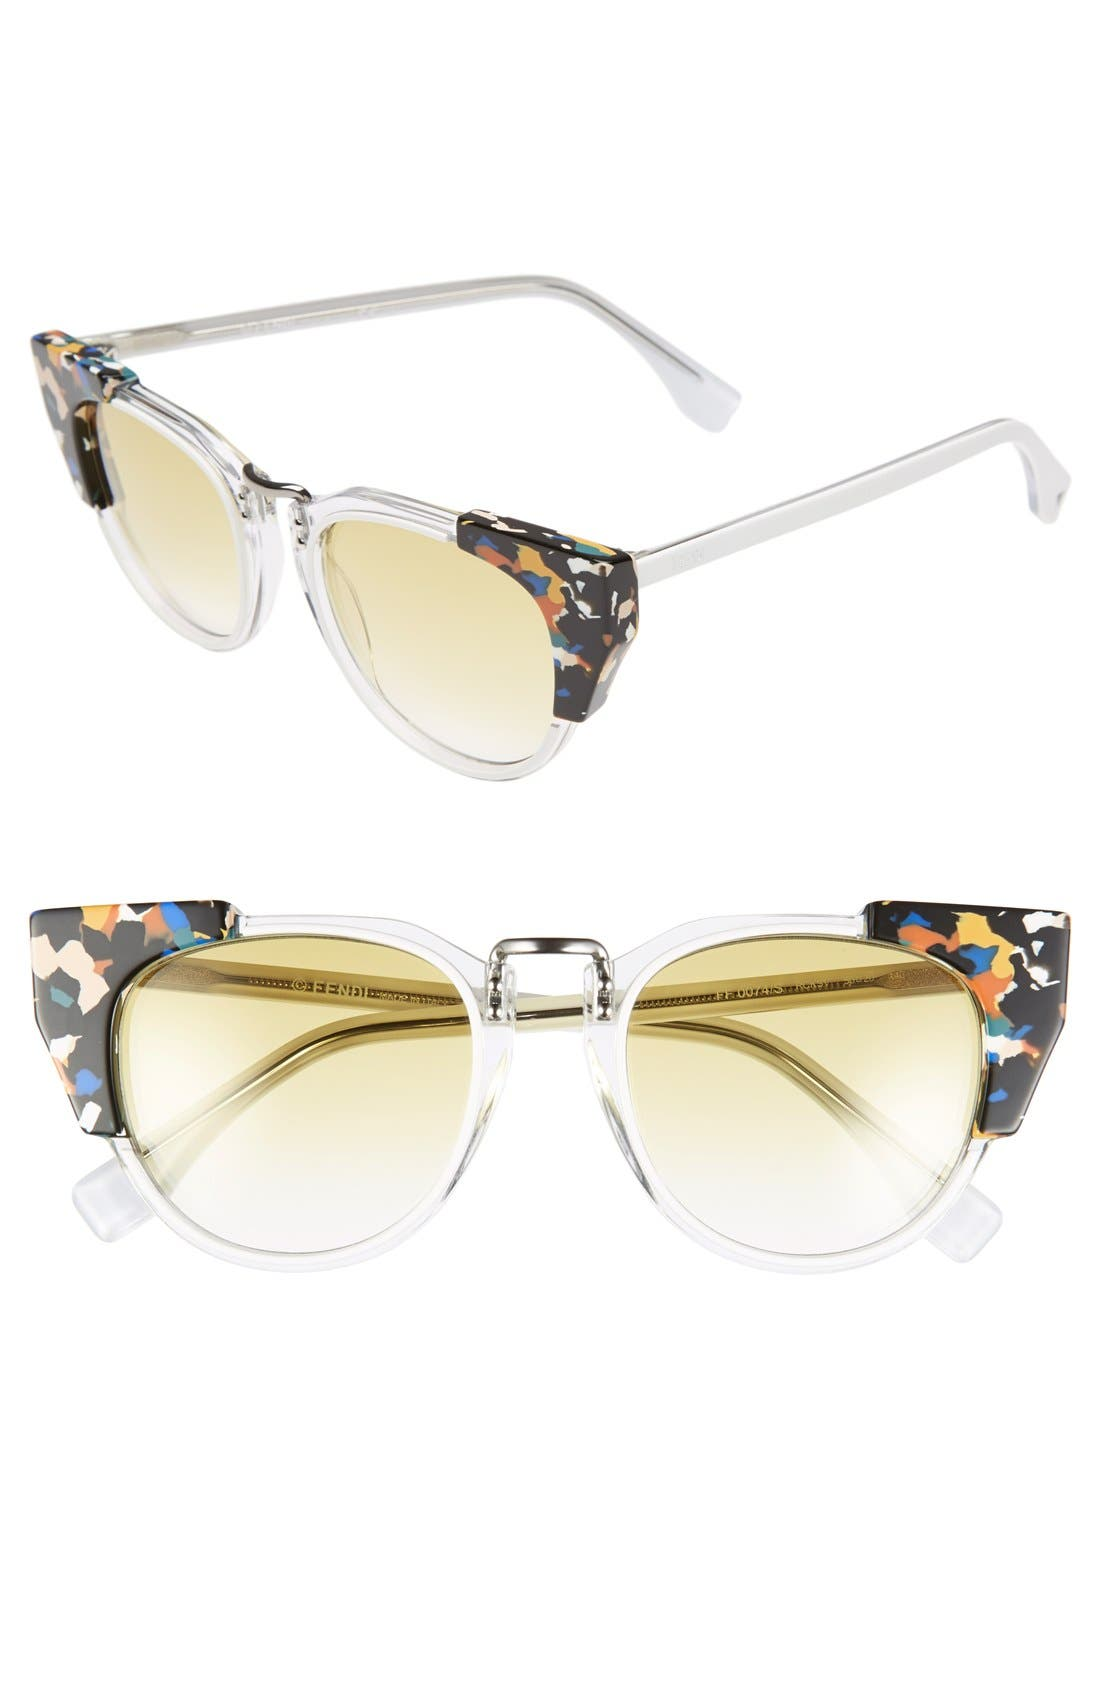 Alternate Image 1 Selected - Fendi 'Fashion Show' 50mm Sunglasses